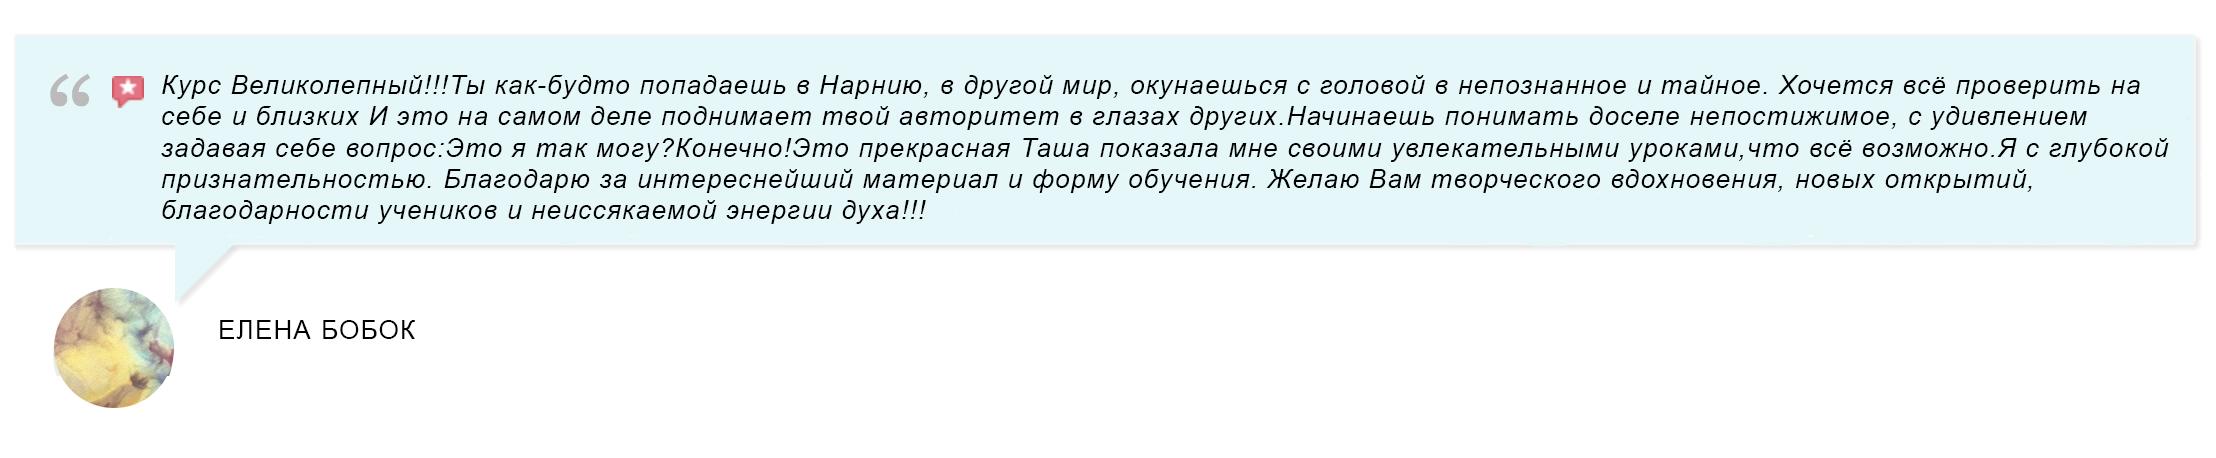 https://astrologtasha.ru/wp-content/uploads/2020/10/elenabobok_otzyv.jpg